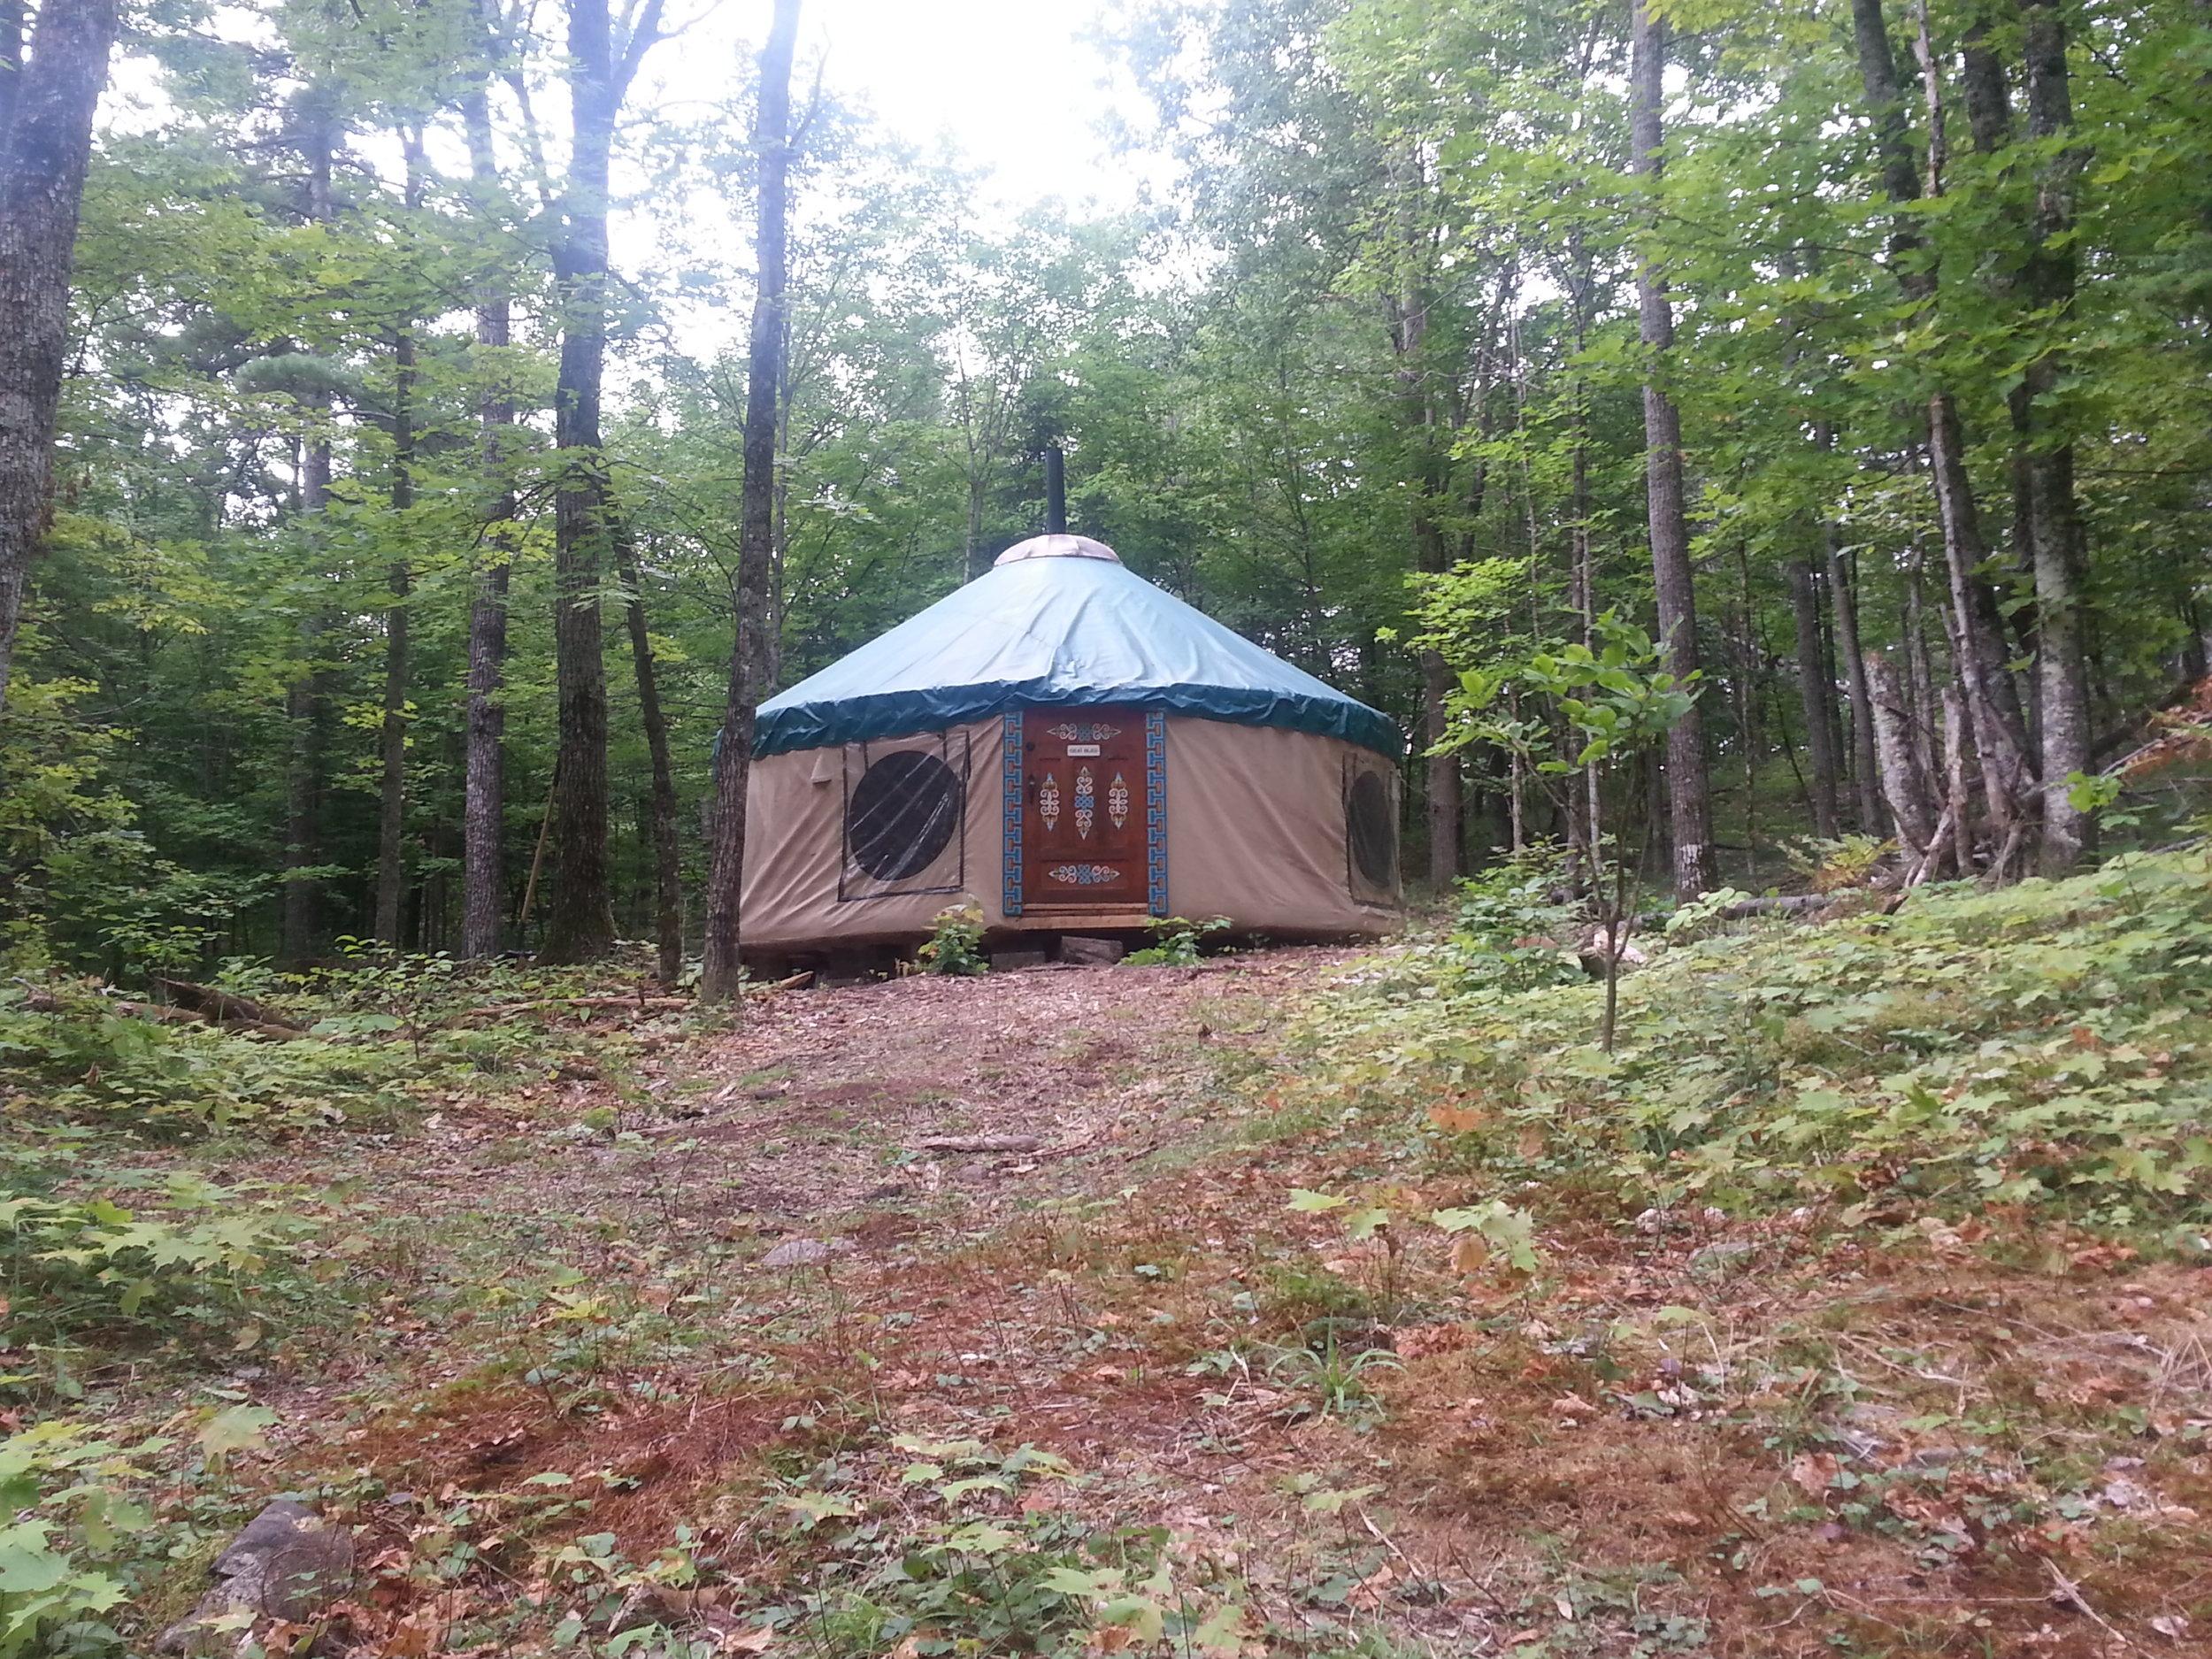 Accommodations -